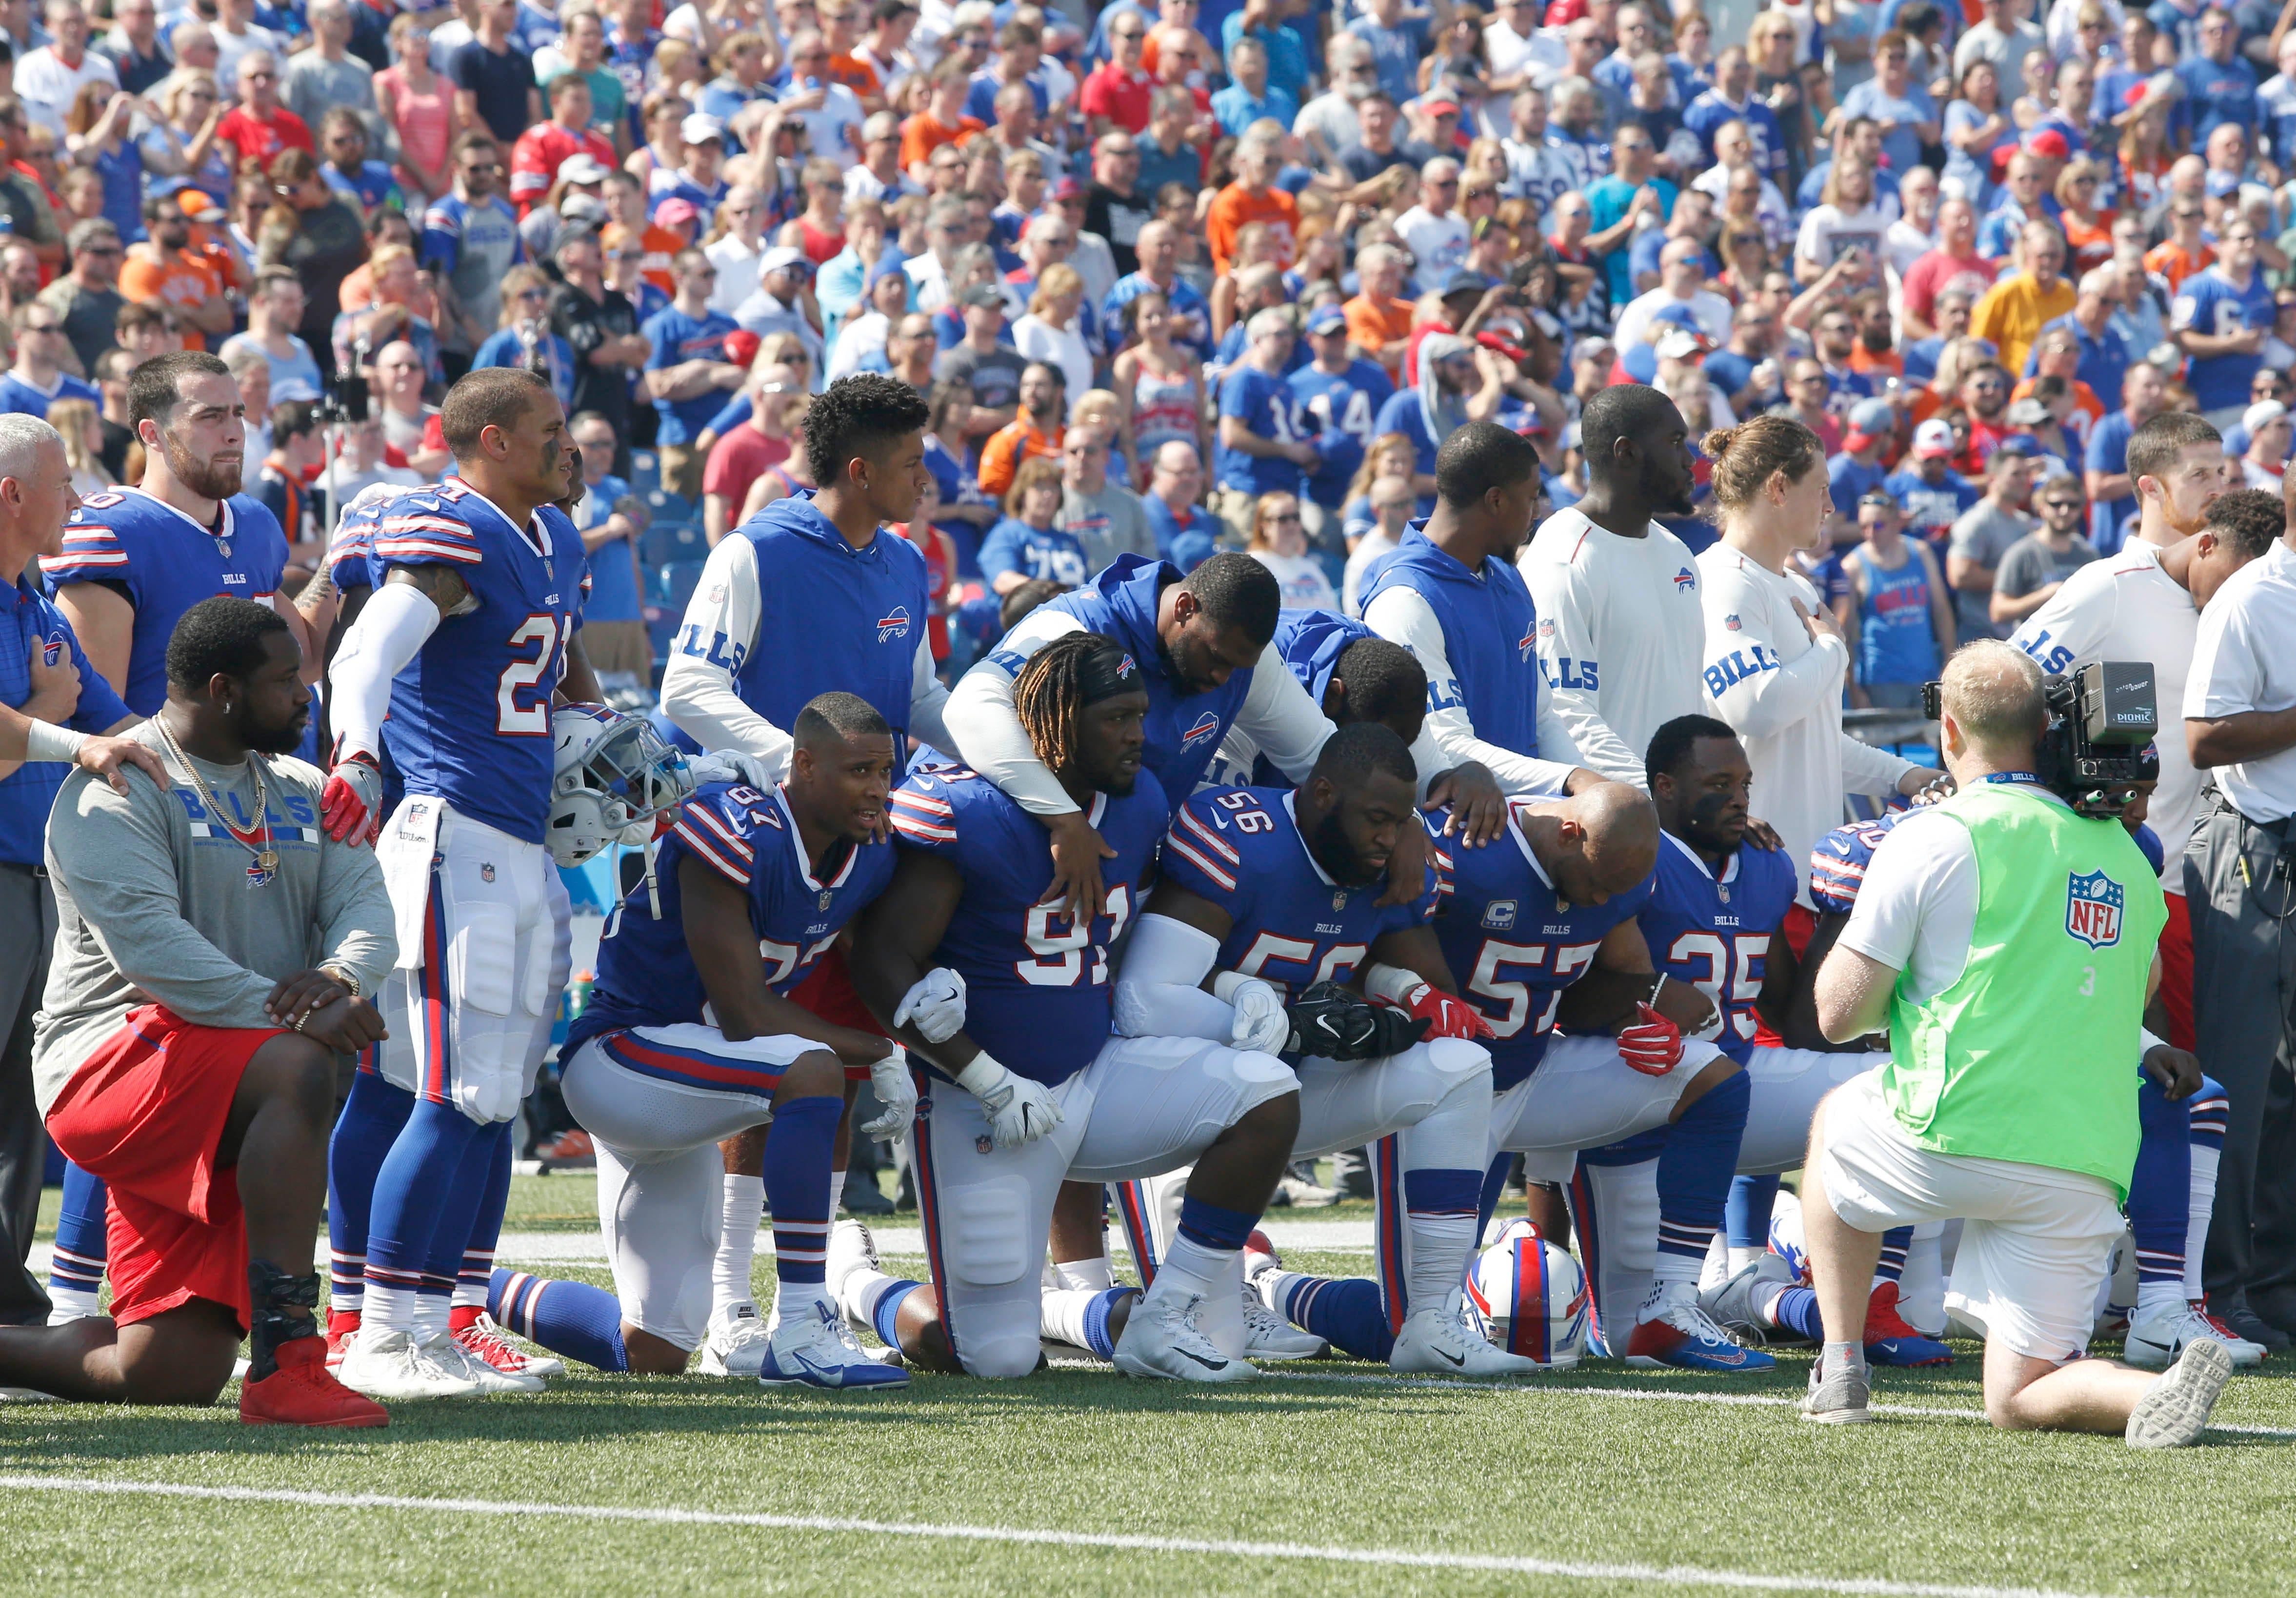 Predating rules of football